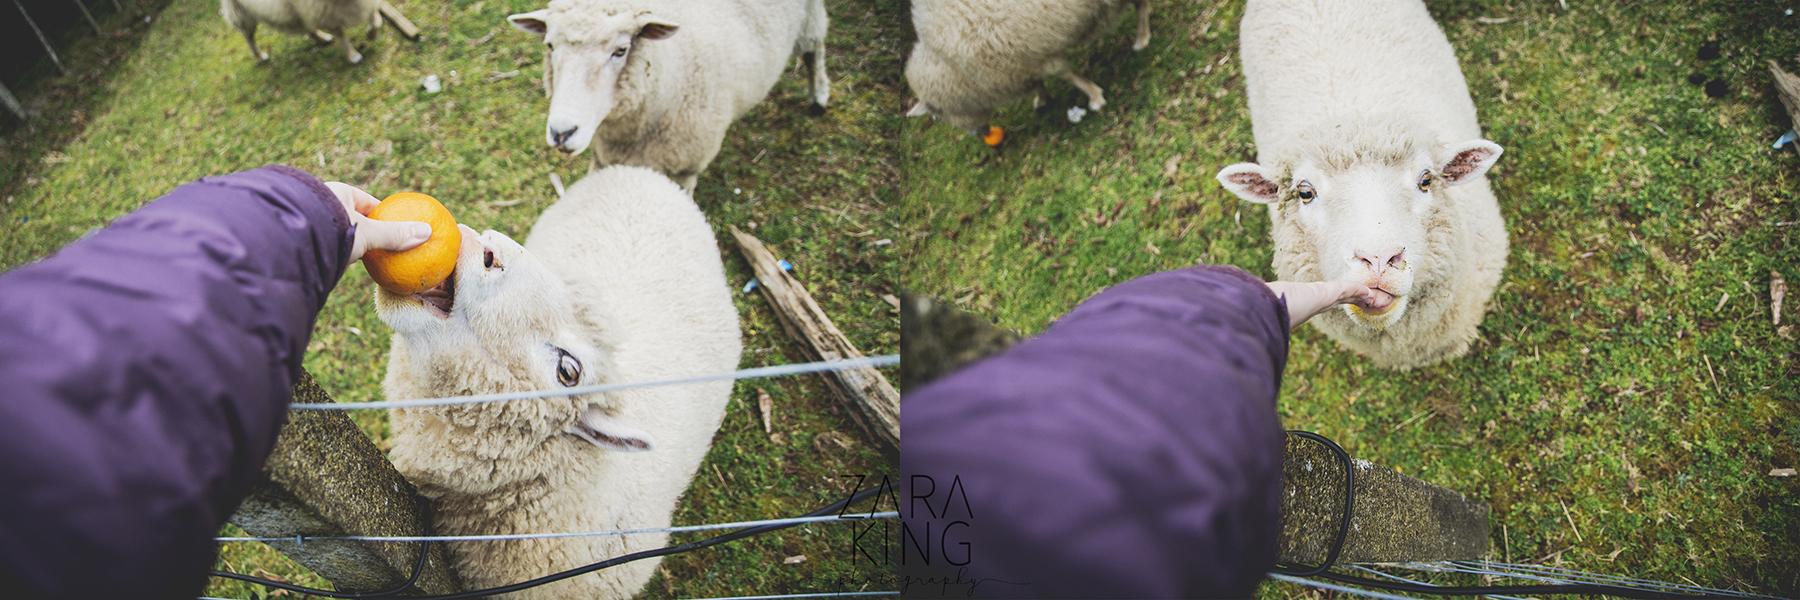 roadtrip - feeding sheep